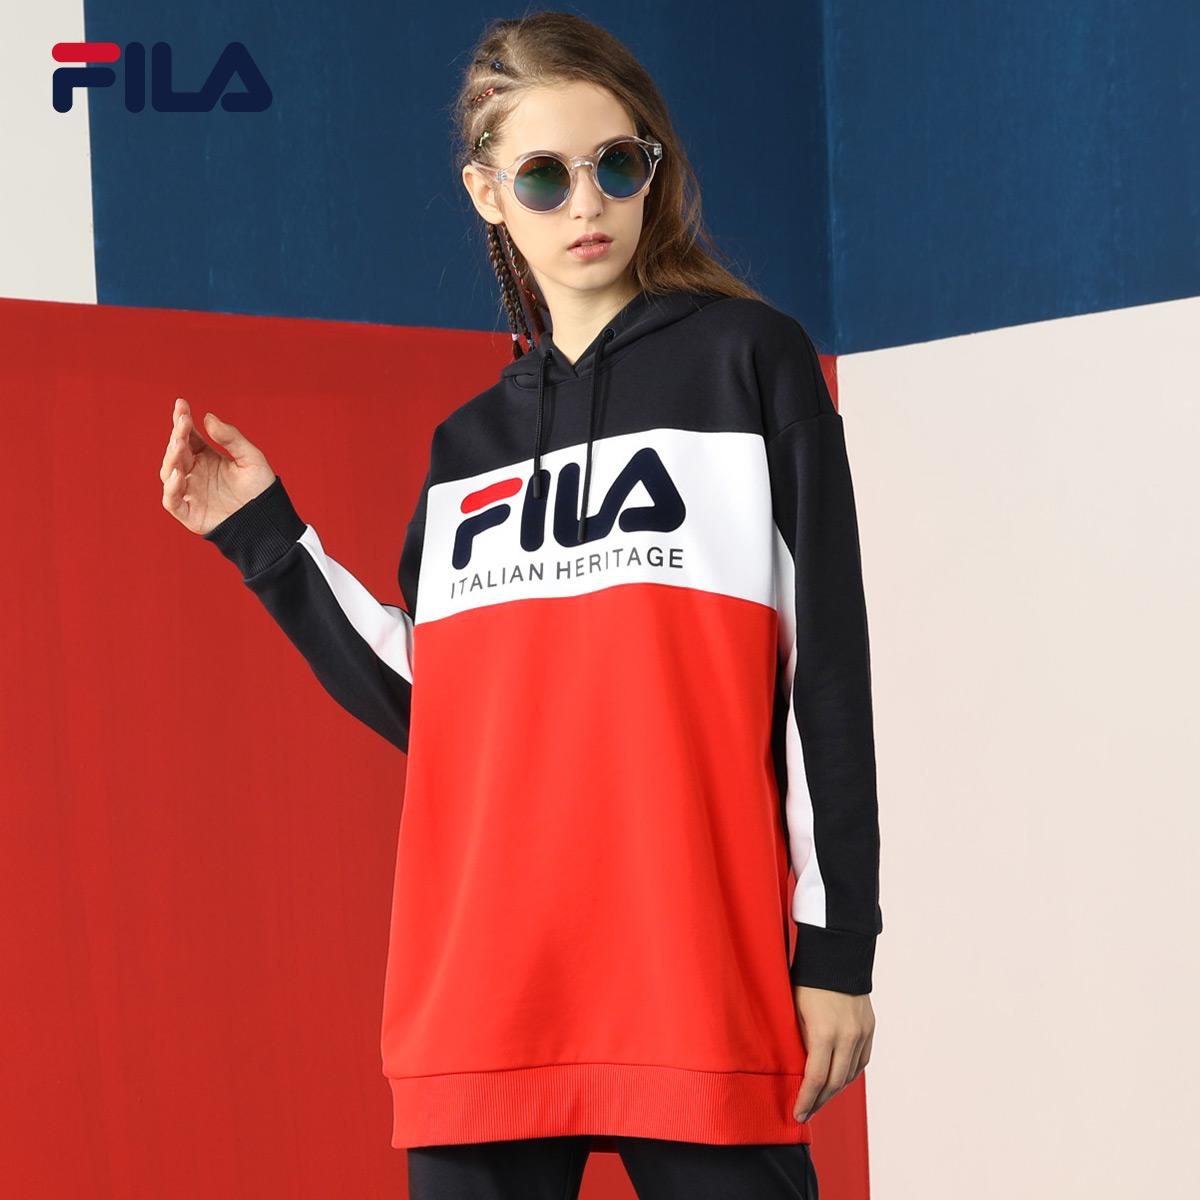 cdf2cc7e FILA Feile women's sweater 2017 Winter new knit long sweater large F LOGO  sports sweater women